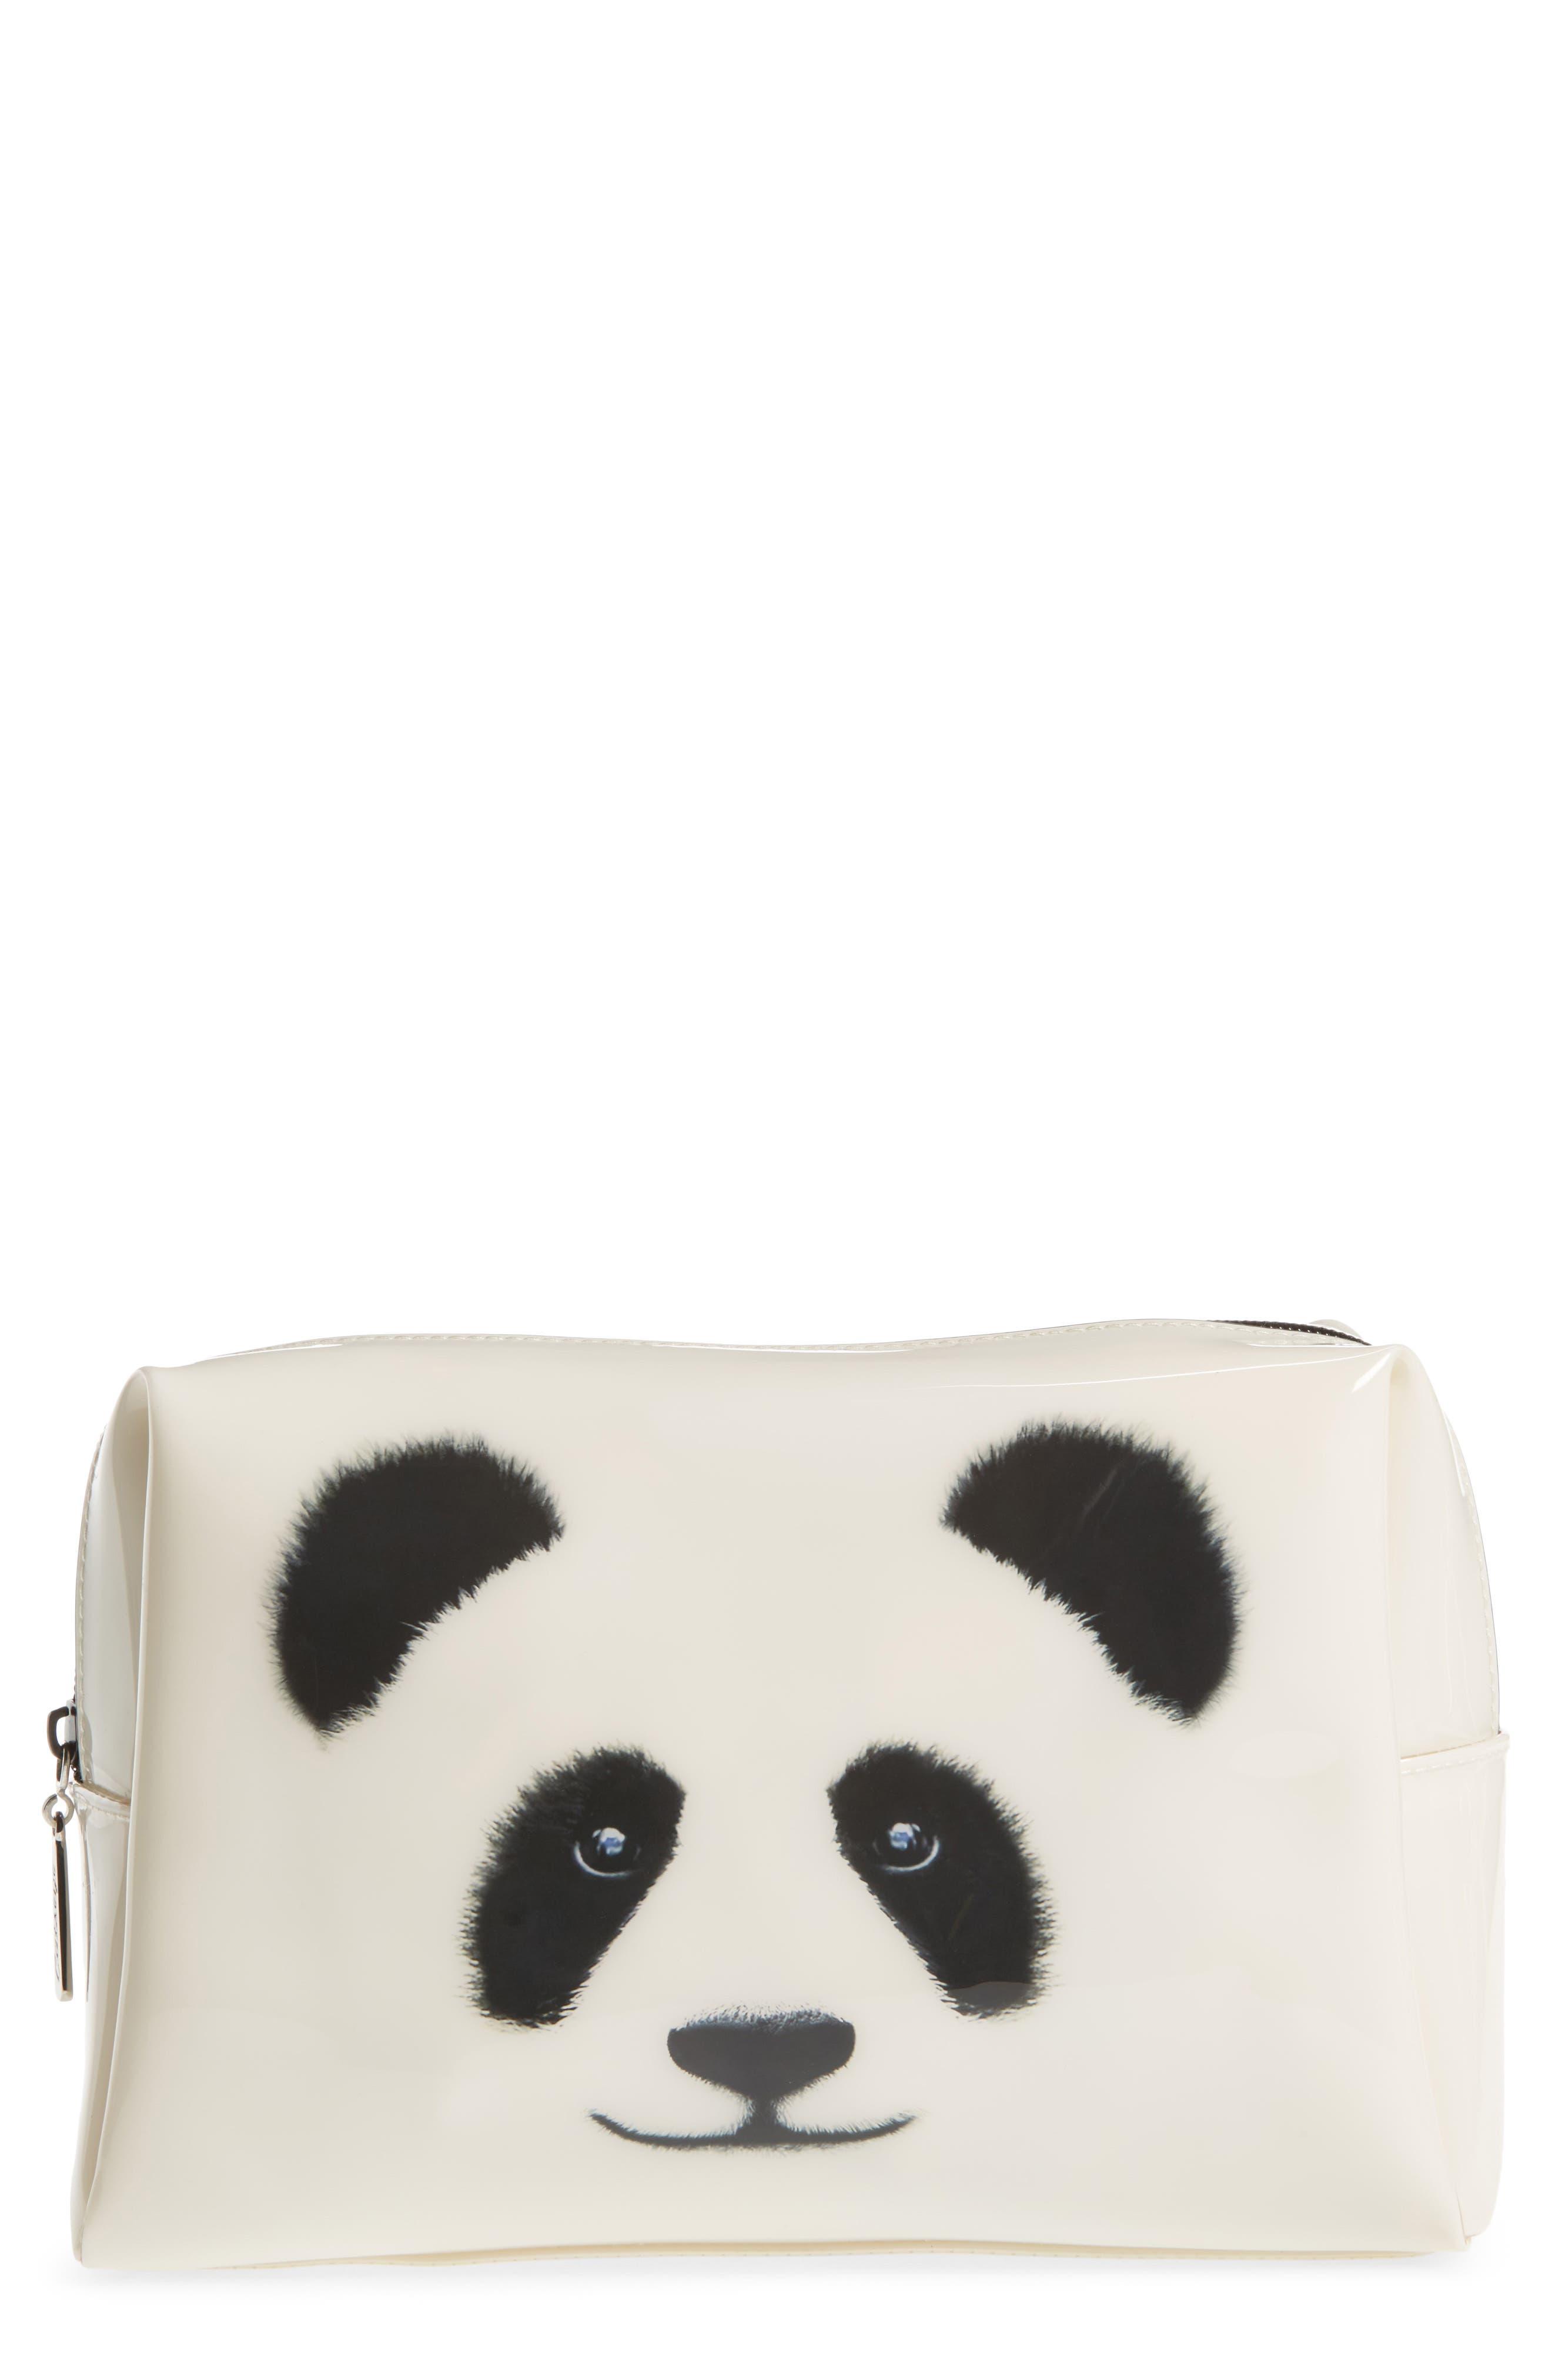 Main Image - Catseye London Big Face Panda Large Cosmetics Case